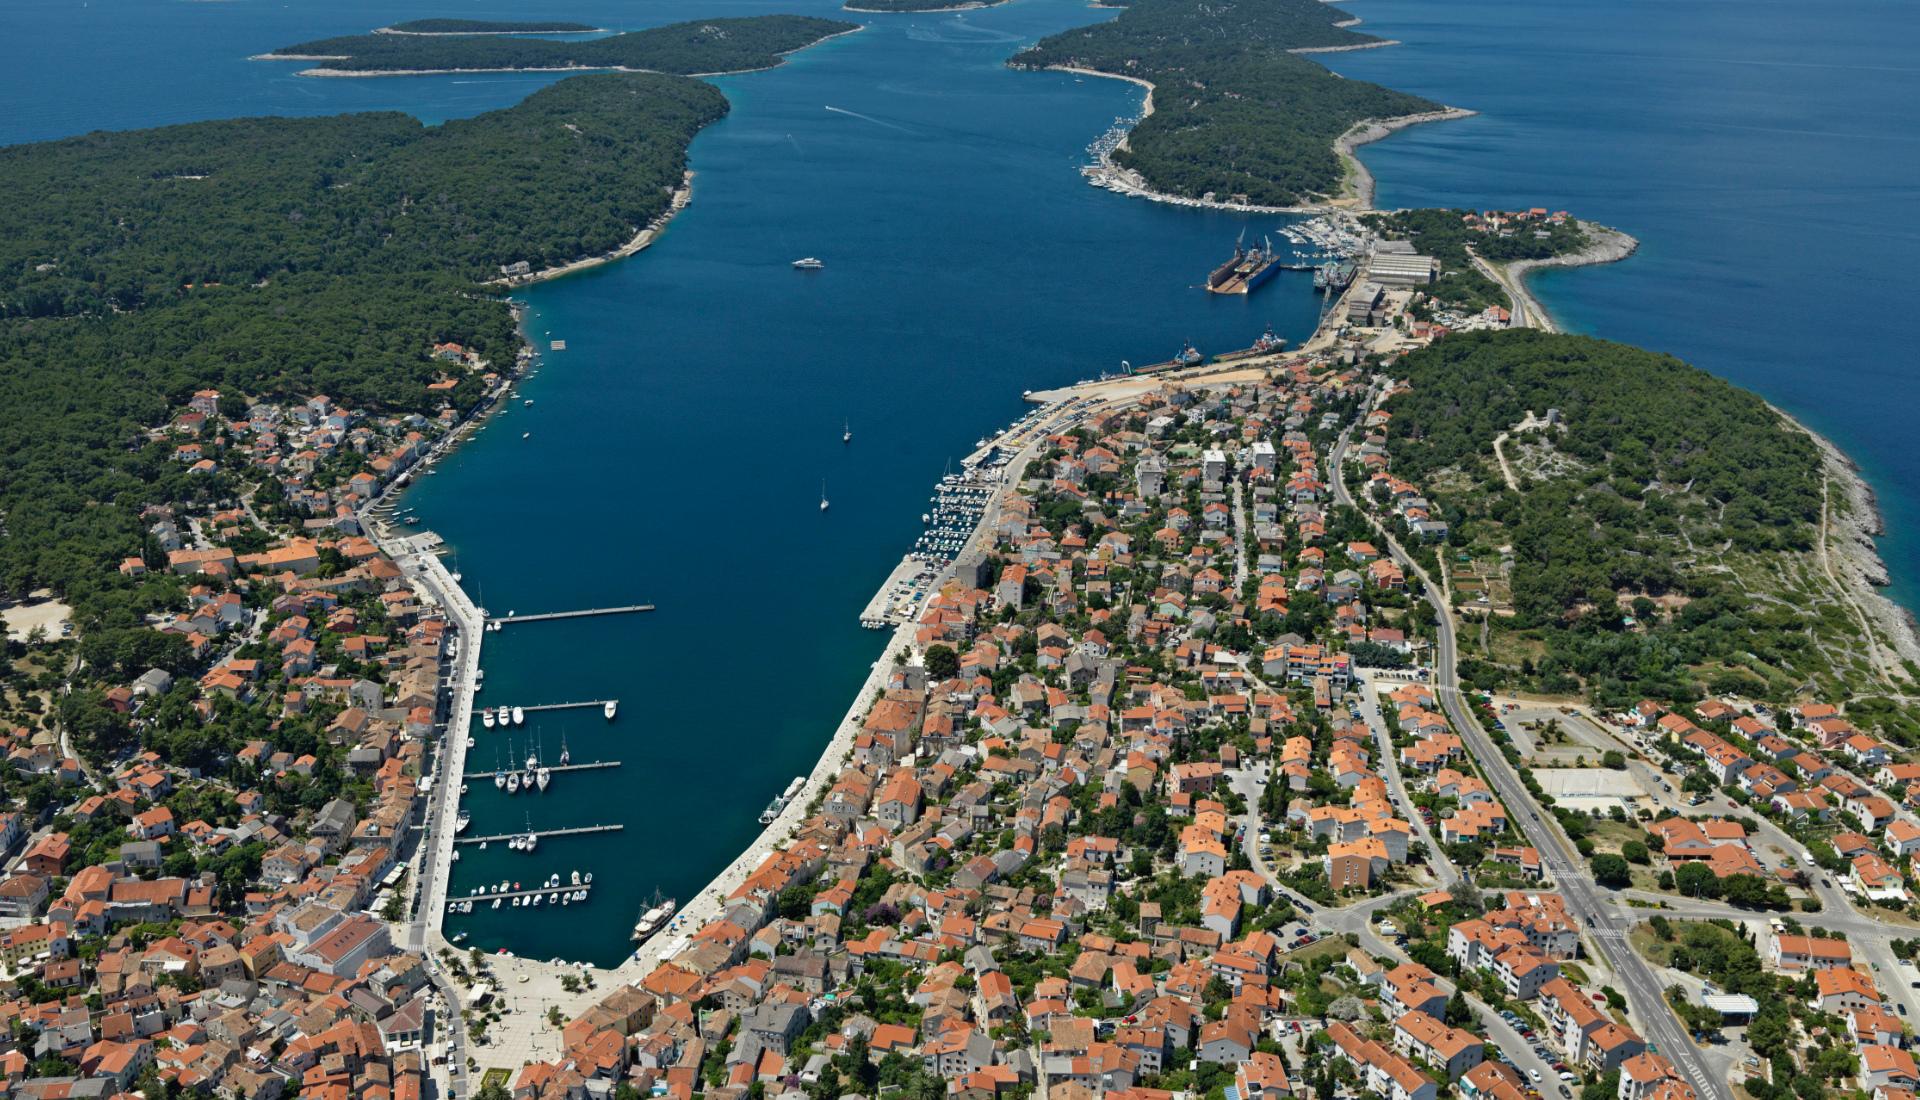 Chorvatsko-přístav - Letova fotografie - Miroslav Kamrla - 2- 1920x1110_2